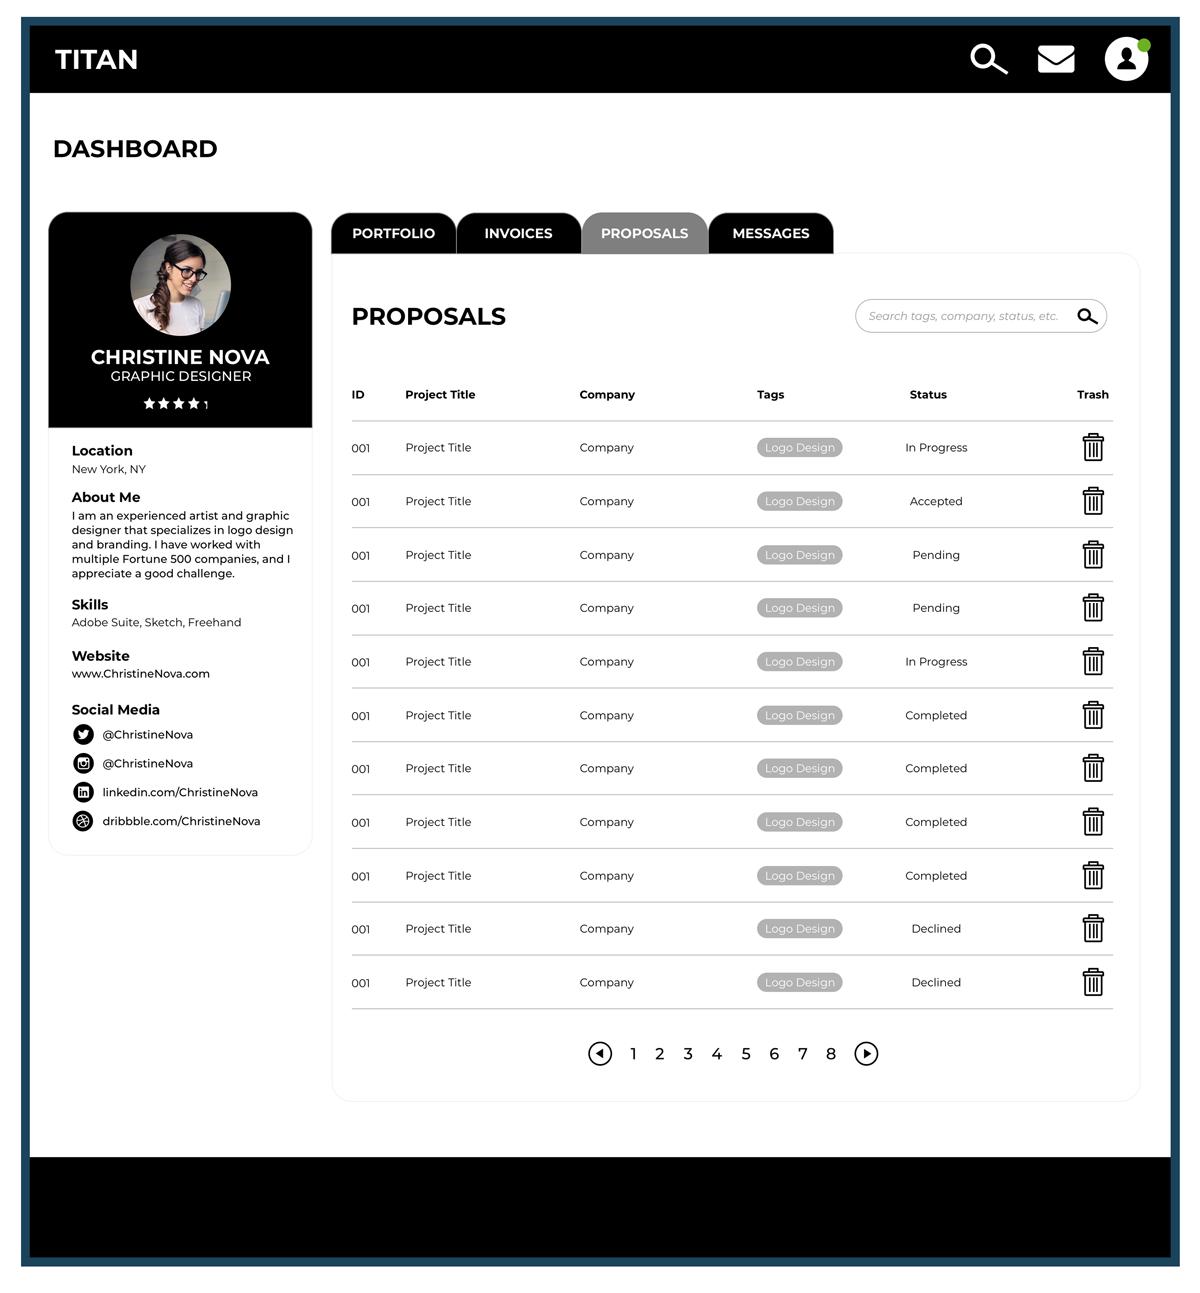 Designer Dashboard  - Proposal tab view